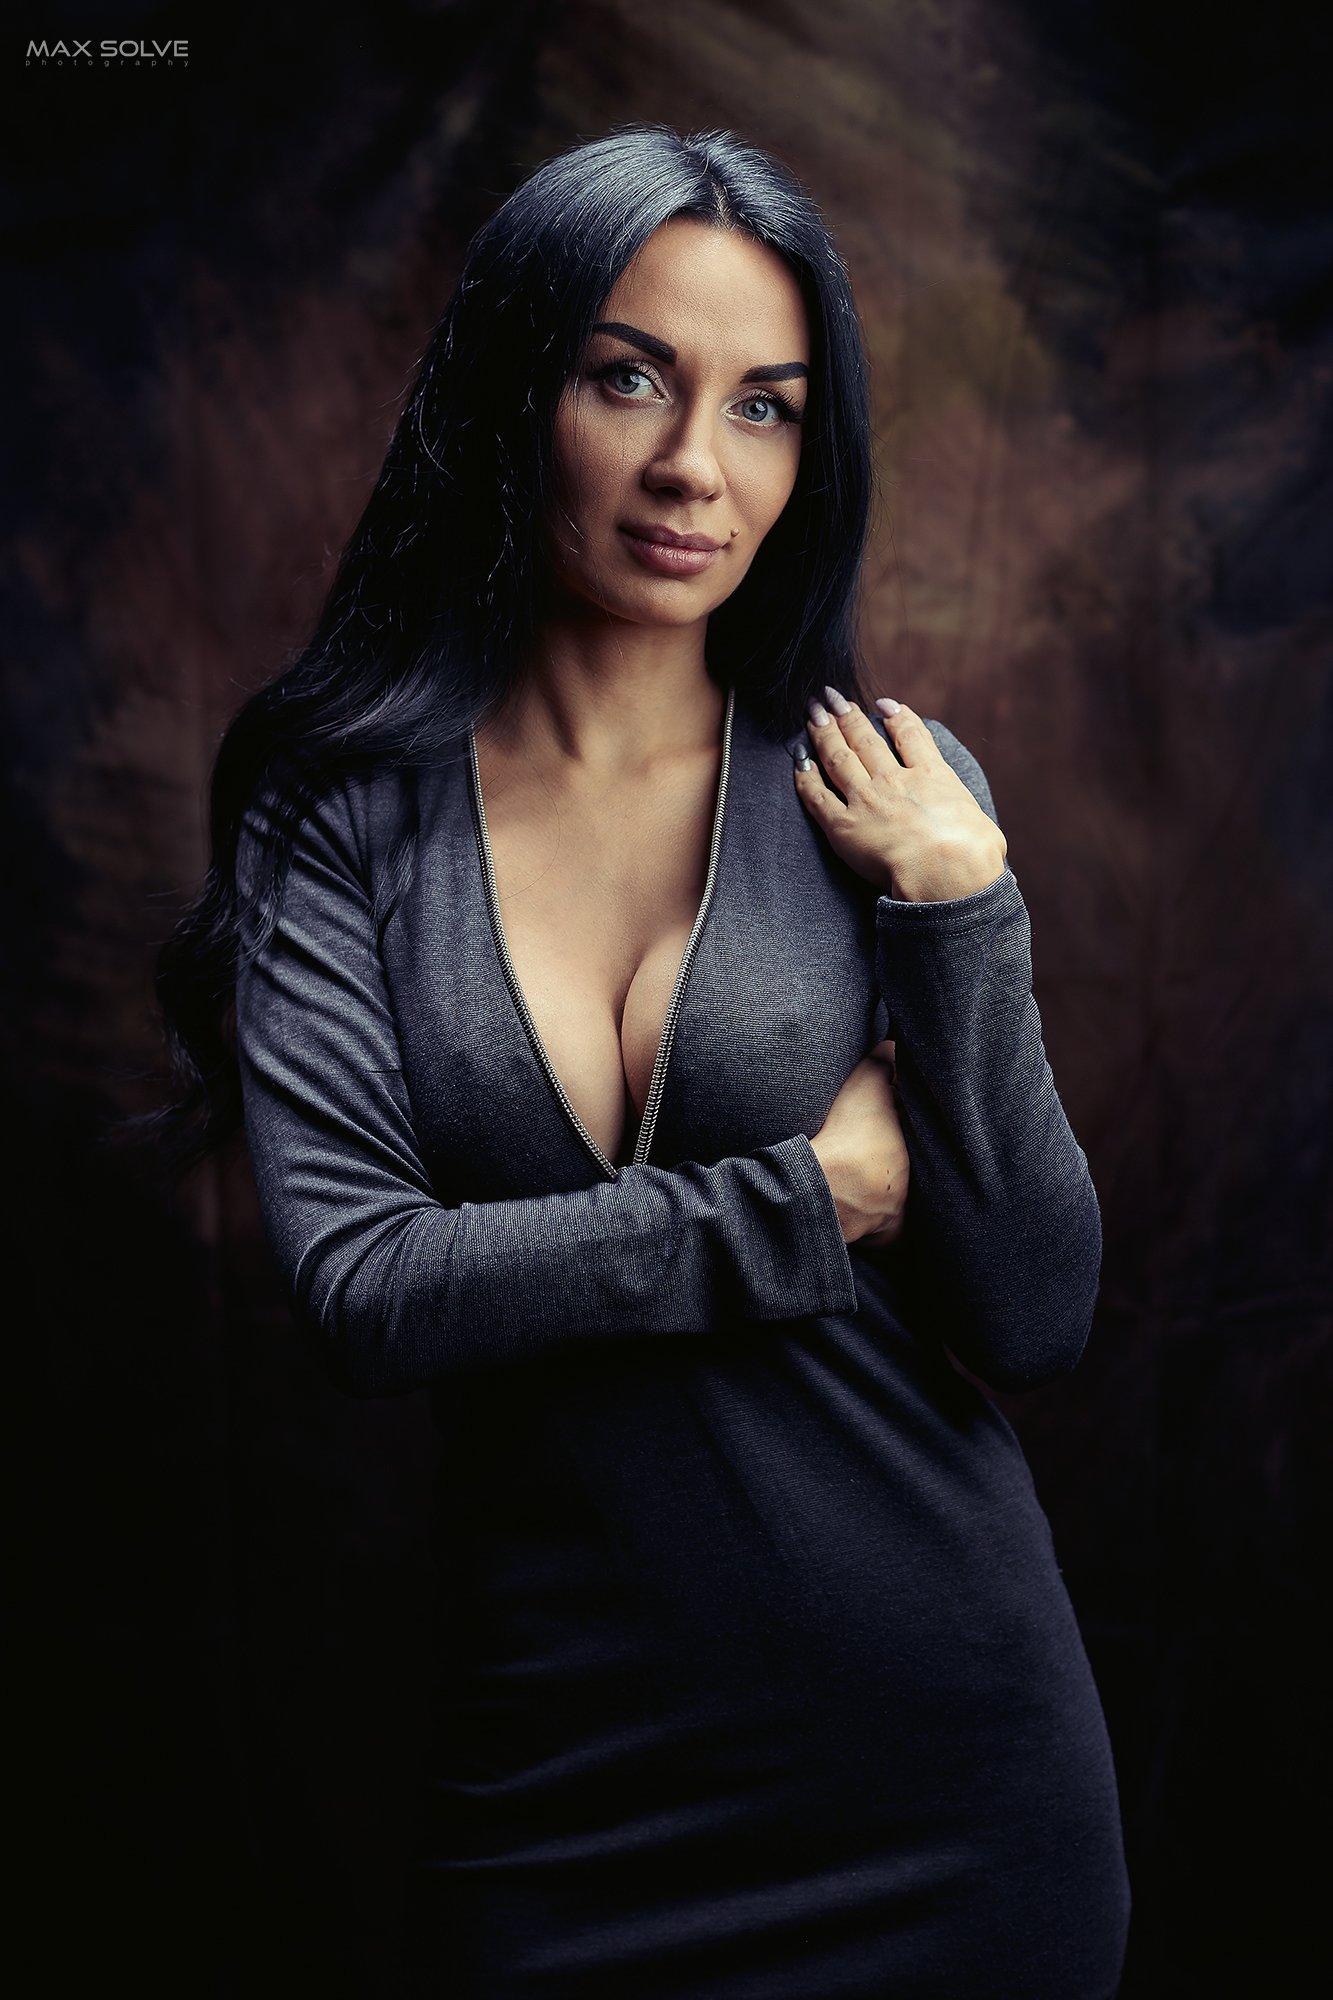 sexy, fashion, portrait, people, beauty, model, models, girl, girls, studio, sensual, hot, , Max Solve